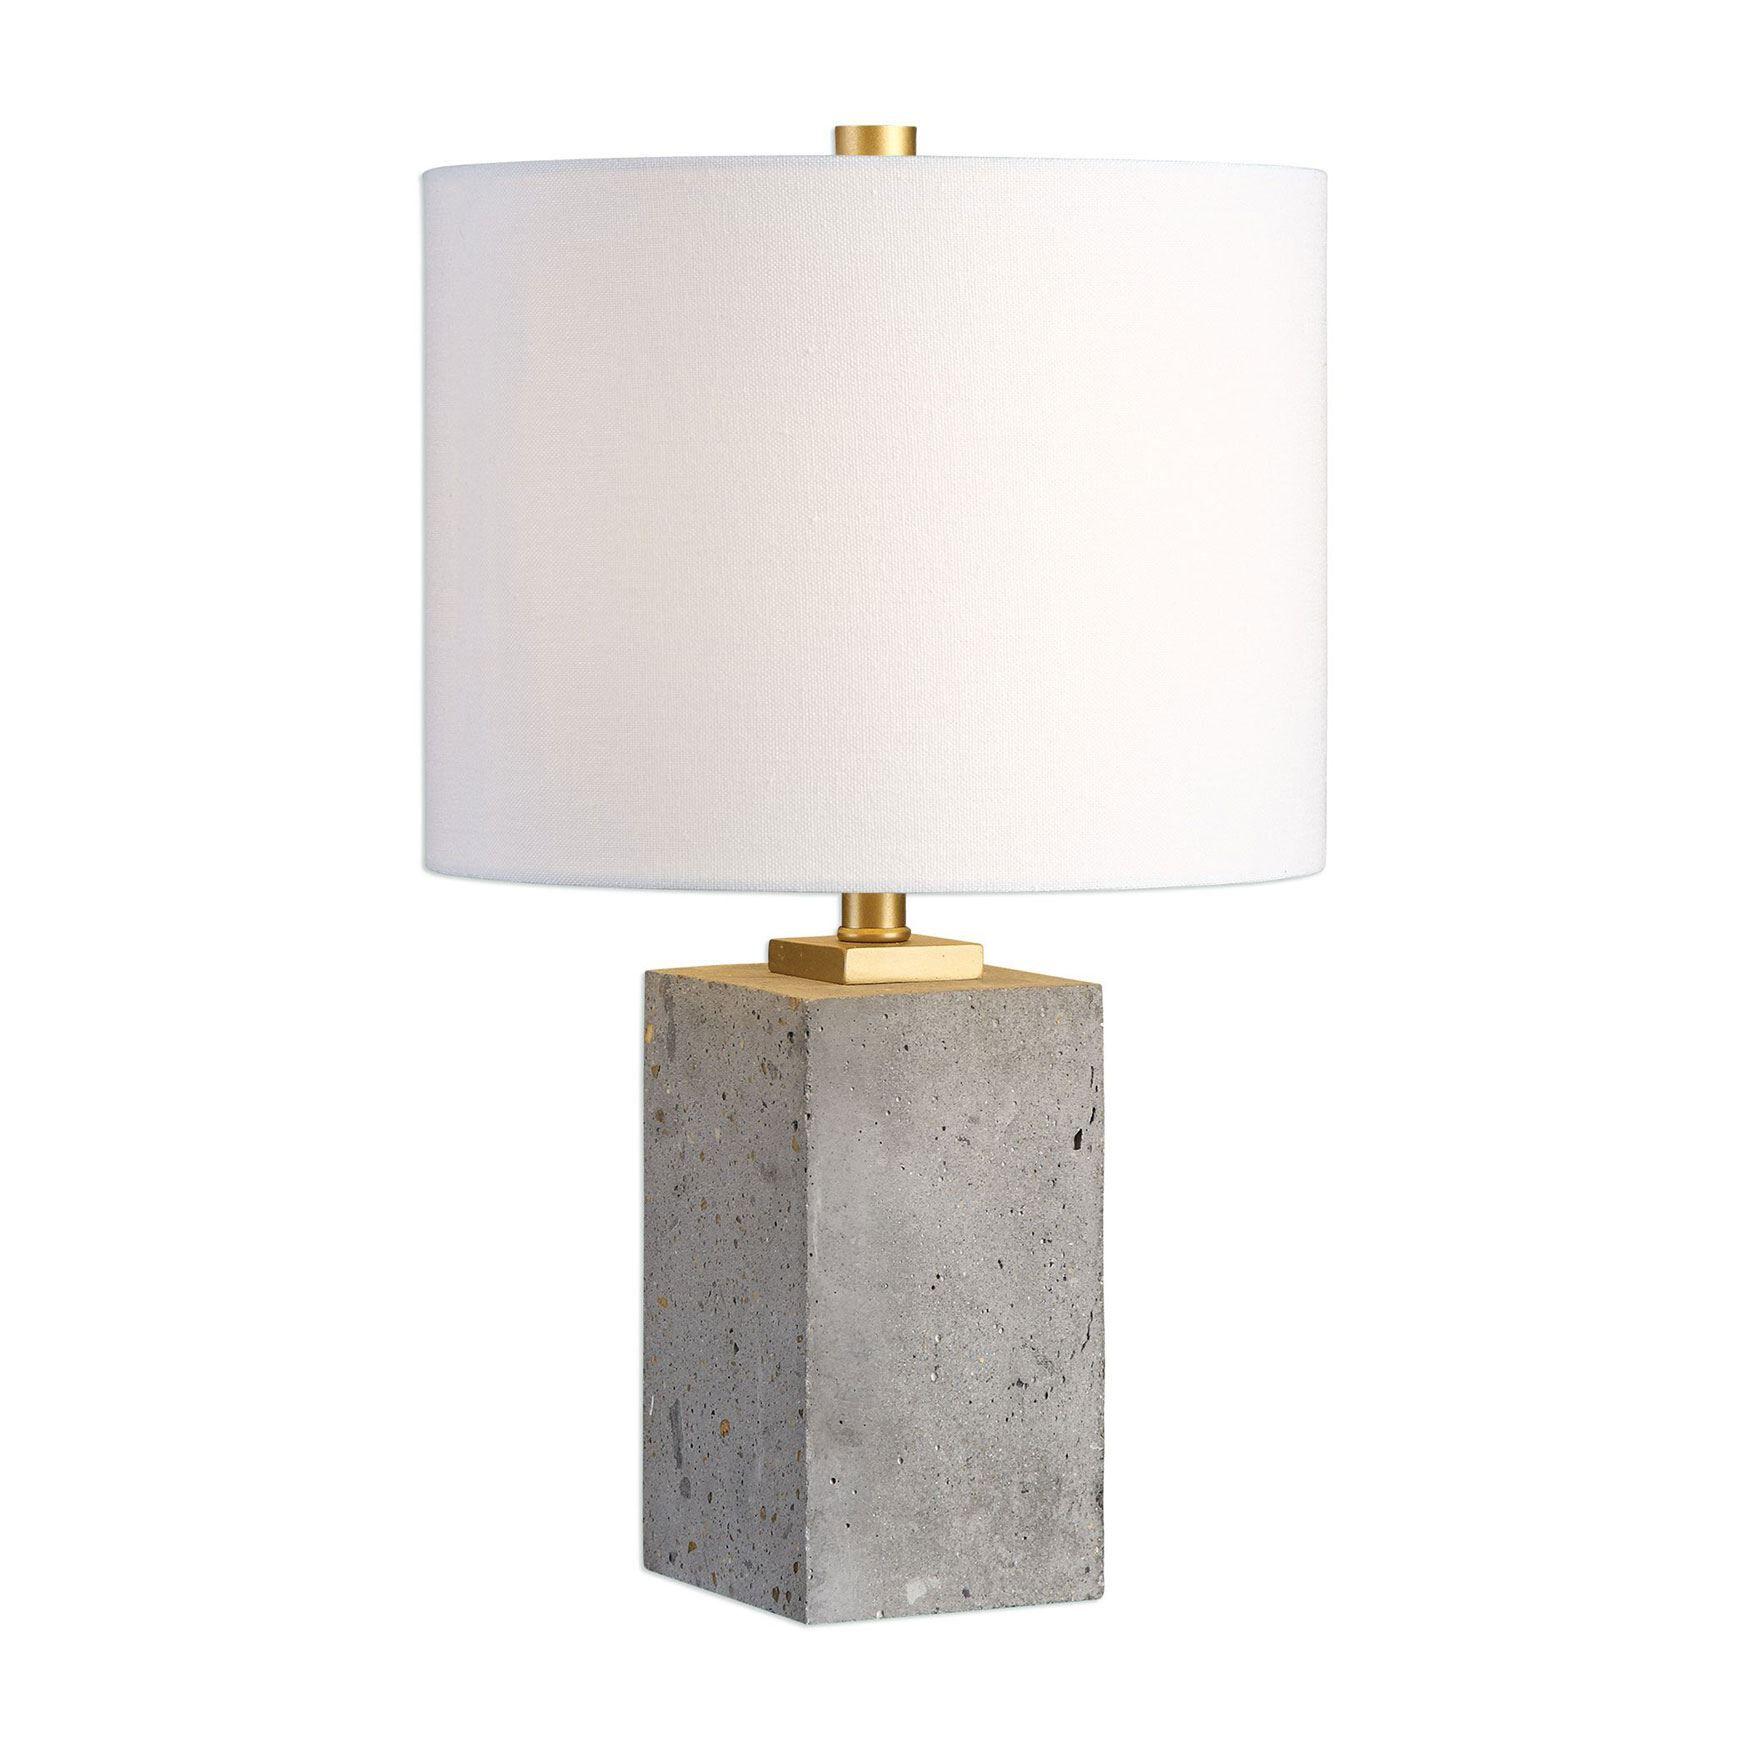 Drexel Concrete Block Lamp